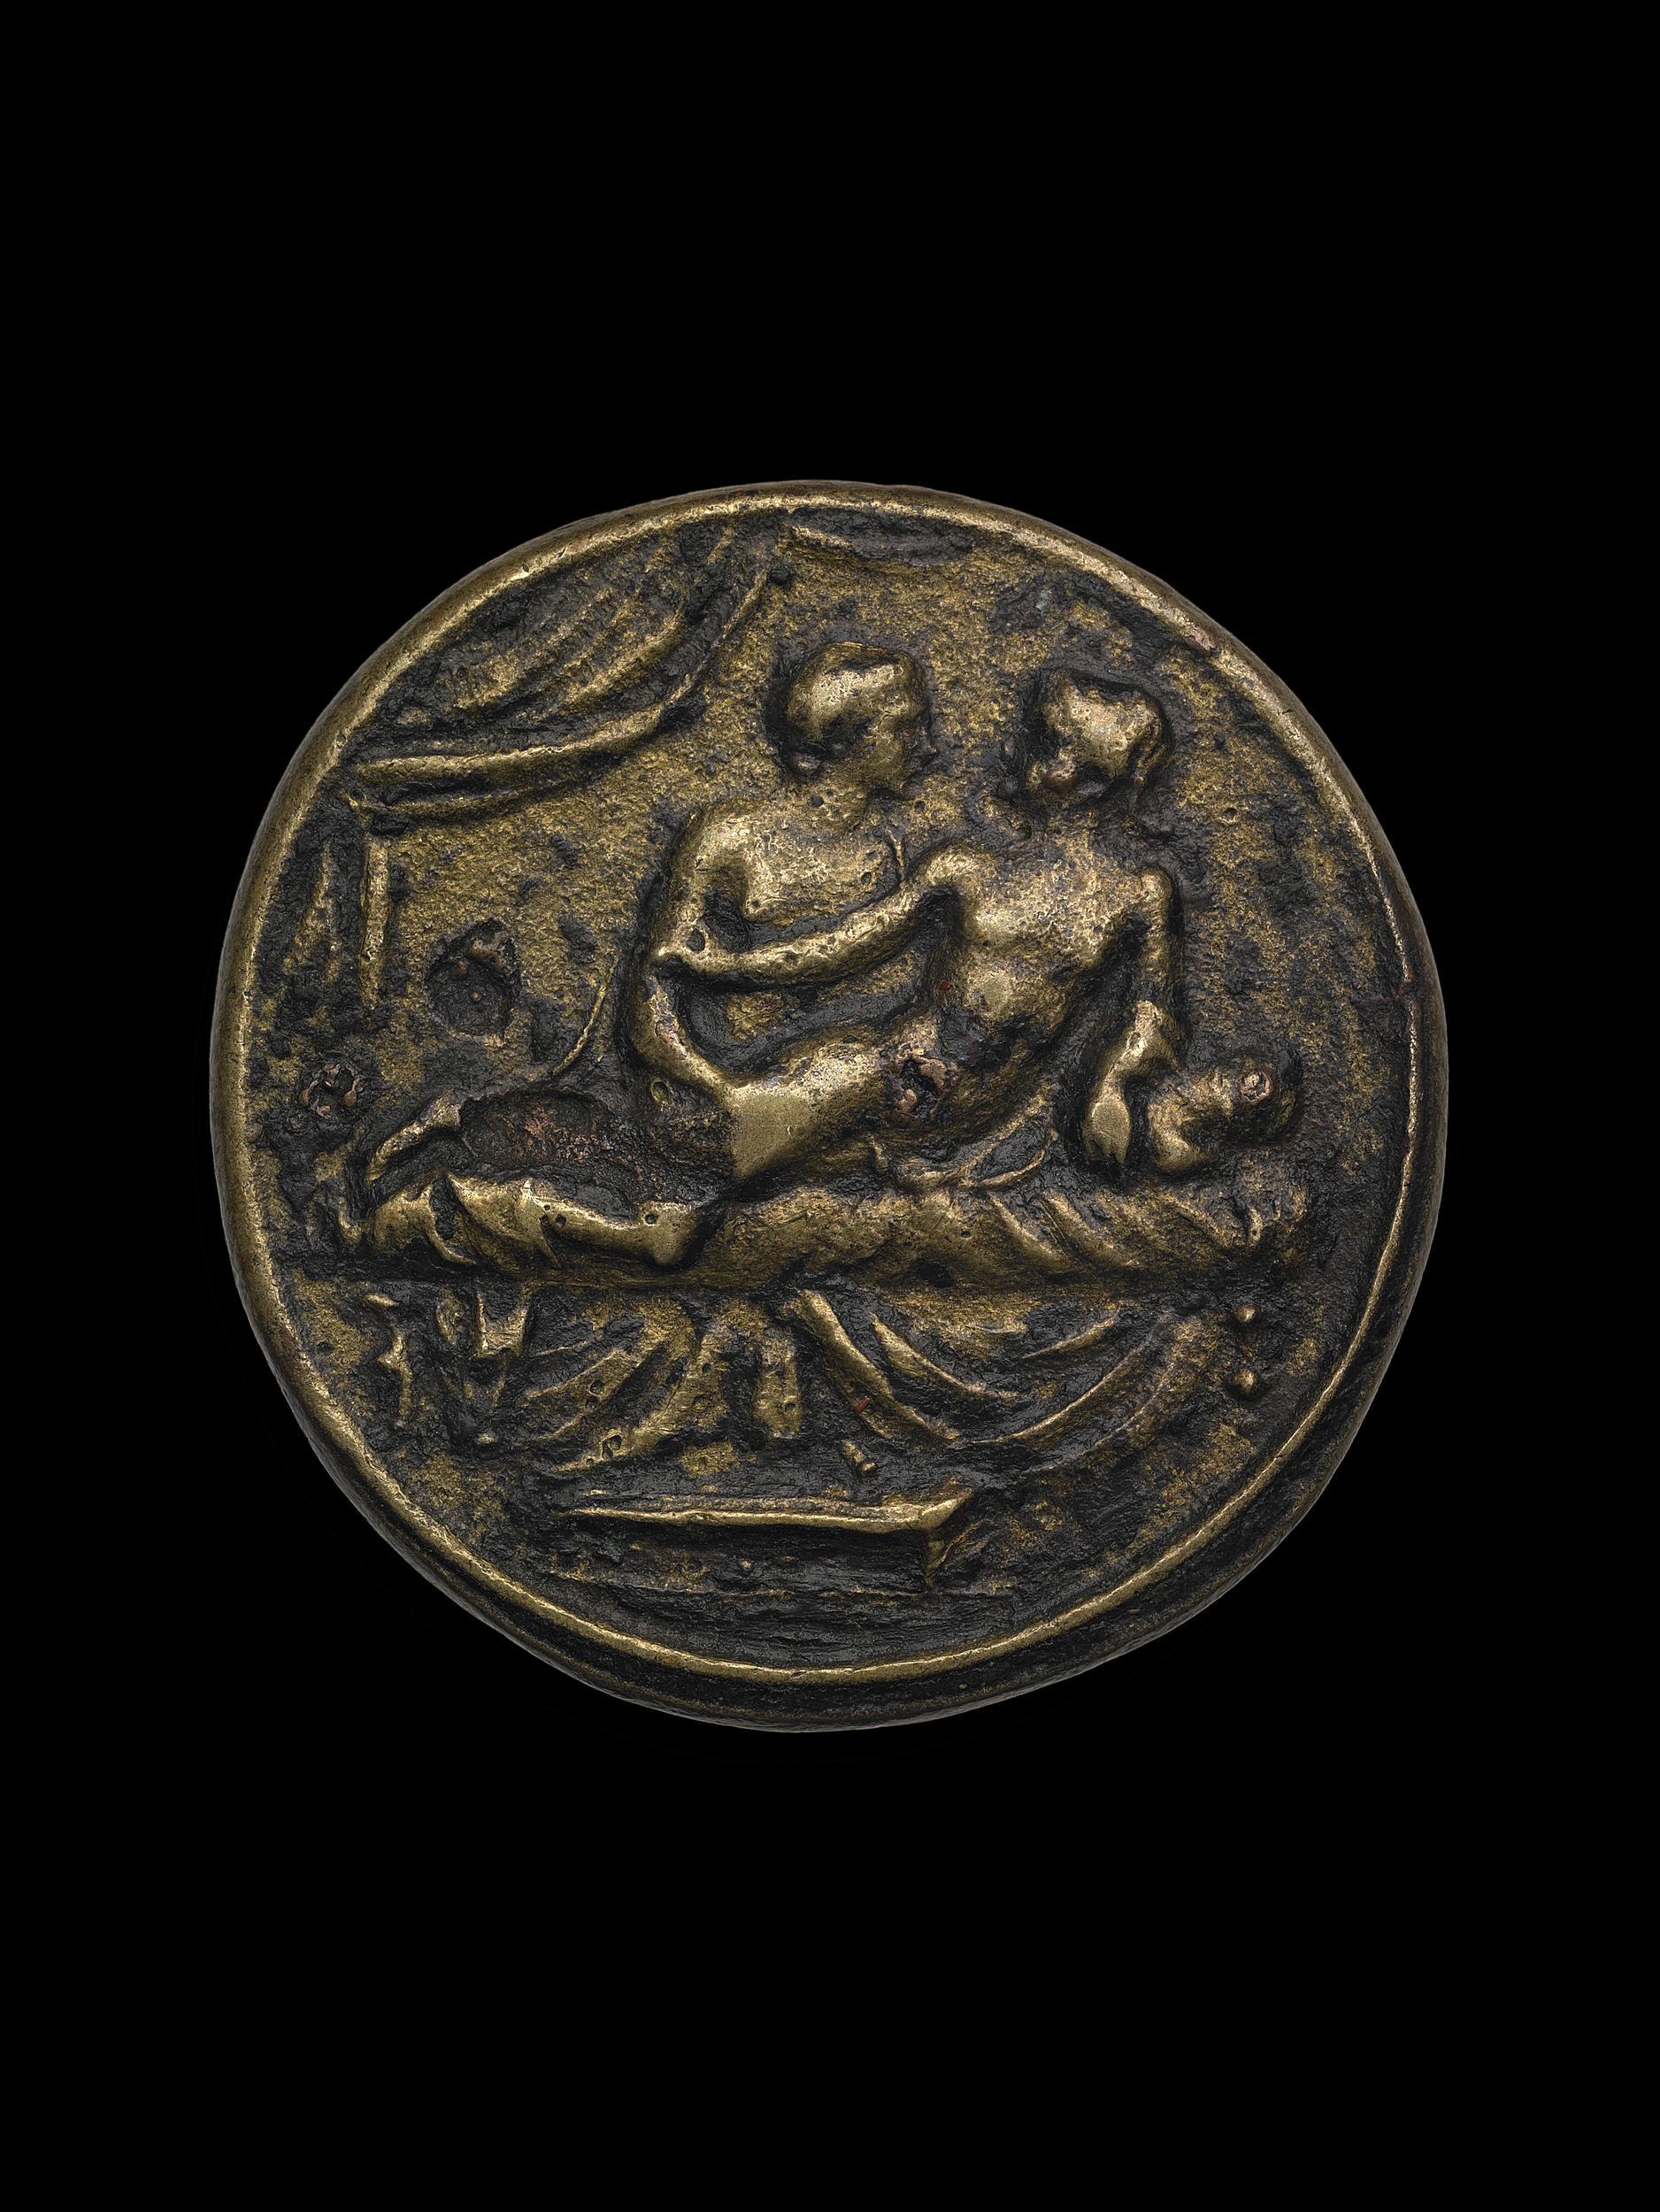 Spintria antique portant au revers le nombre XV © The Trustees of the British Museum